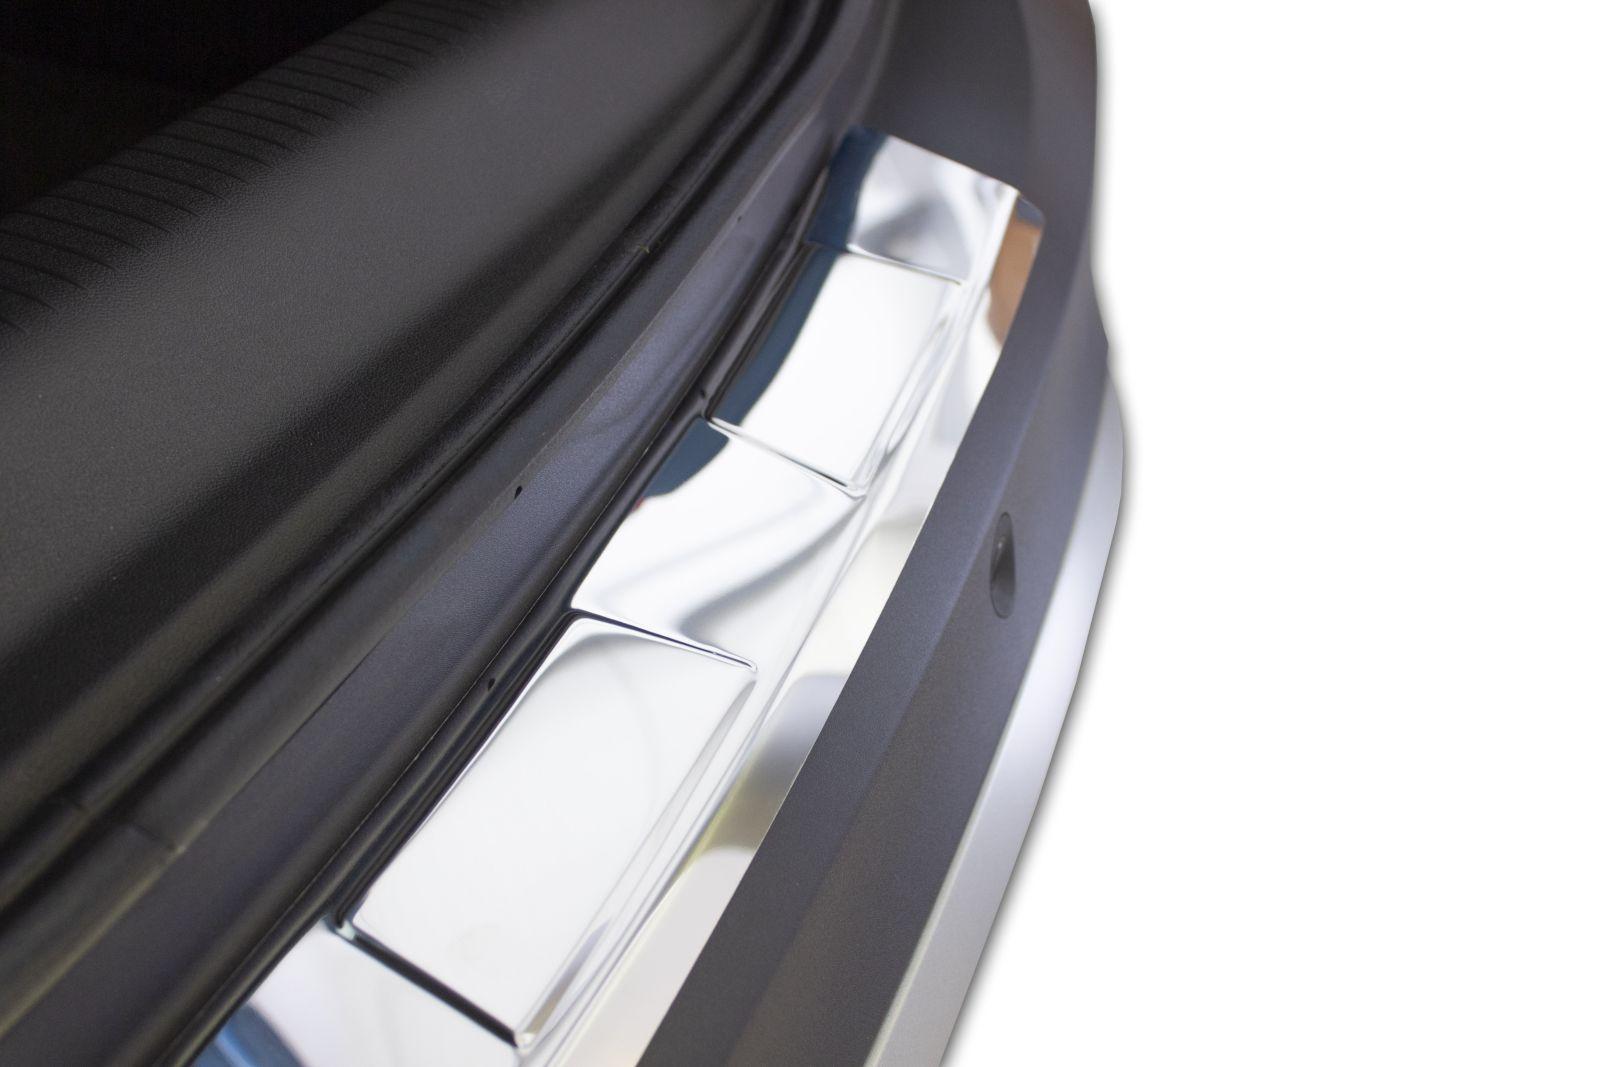 Nerezový kryt náraznika Ford B-Max 2012-2017